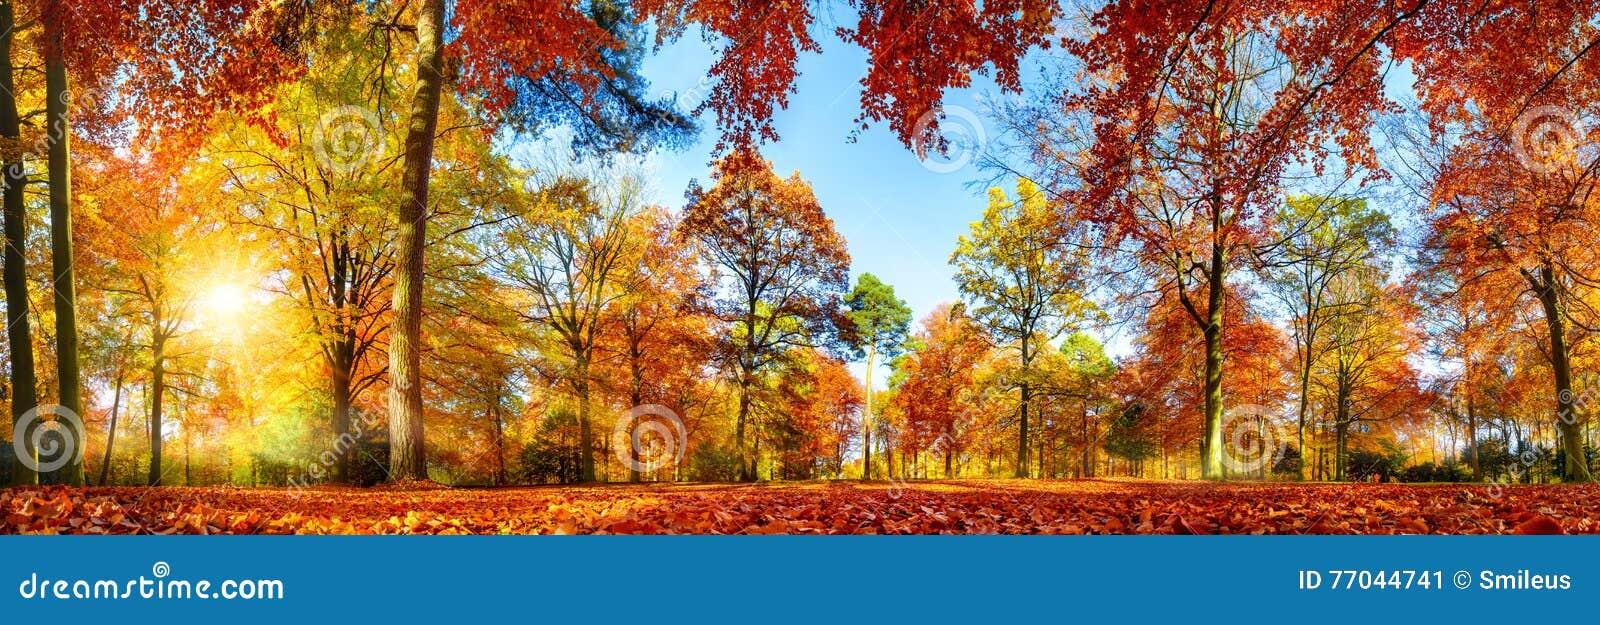 Färgrik skogpanorama i höst